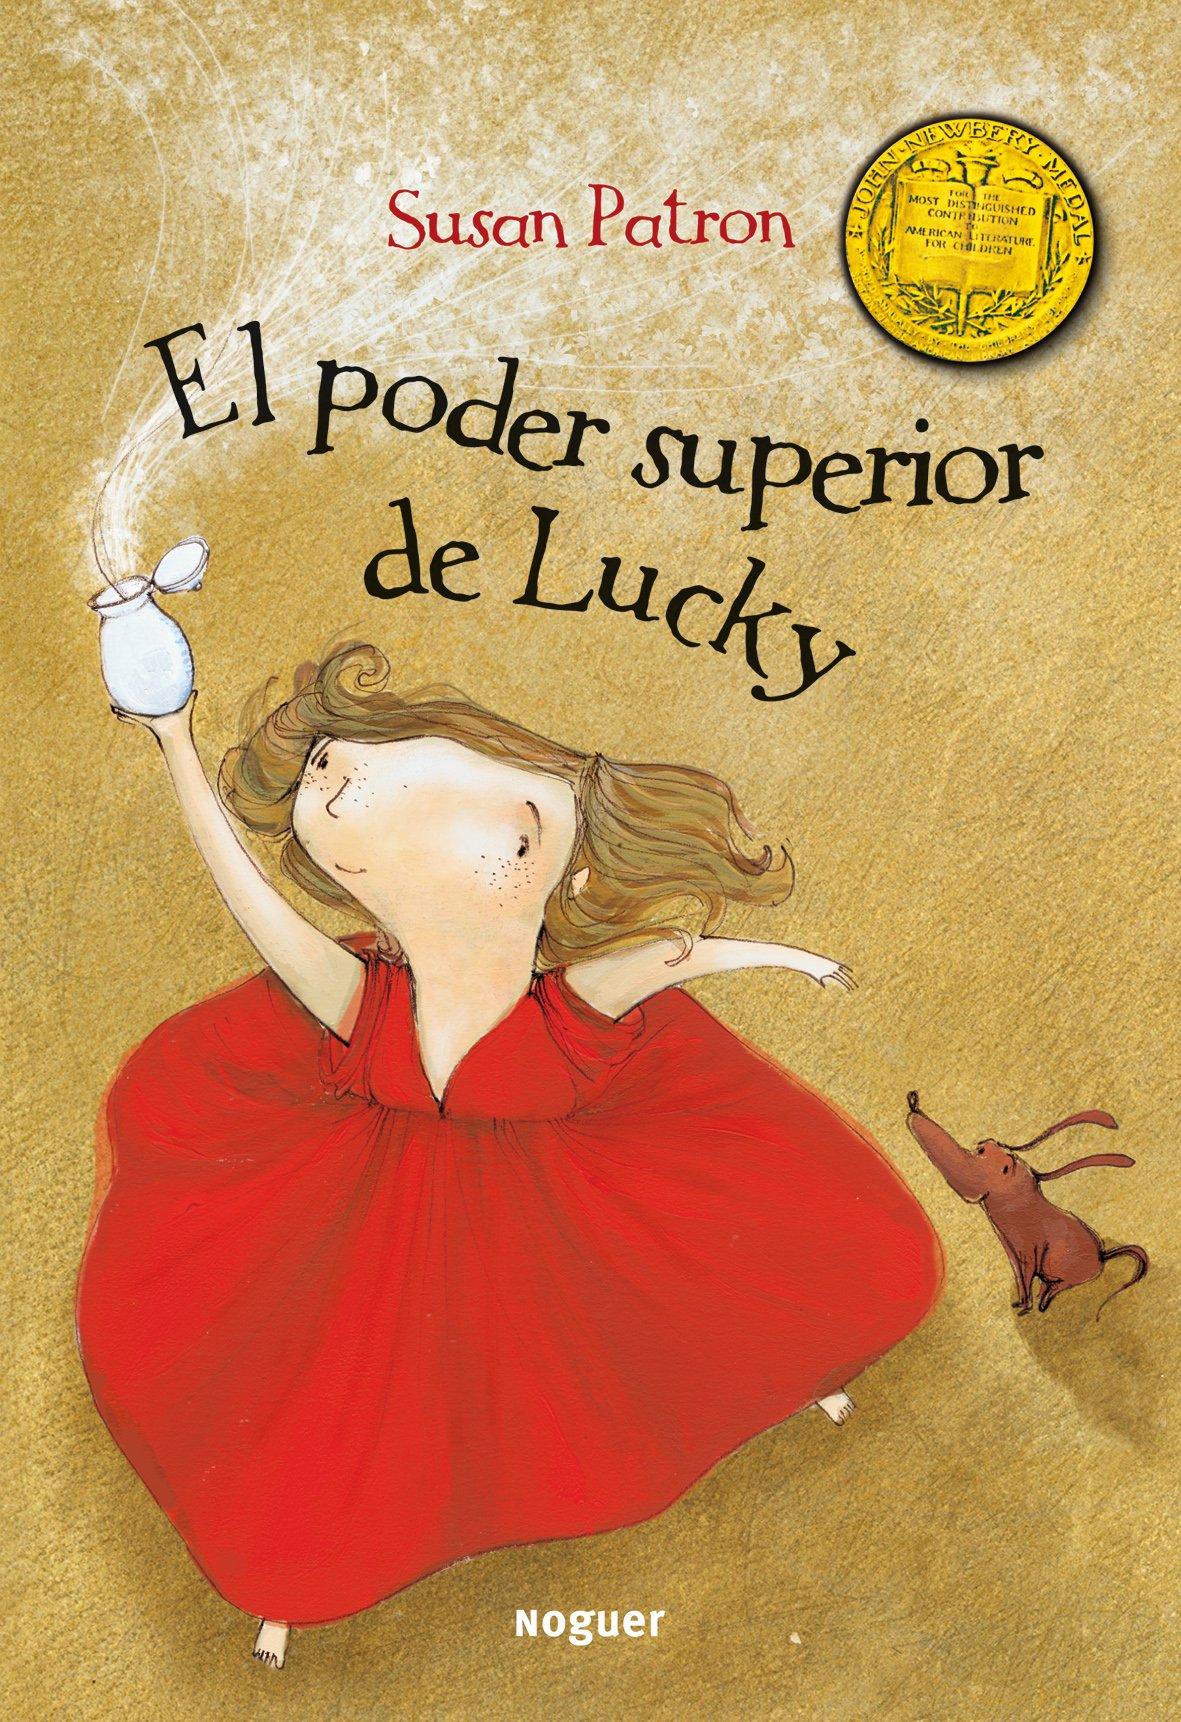 el-poder-superior-de-lucky-the-higher-power-of-lucky-spanish-edition